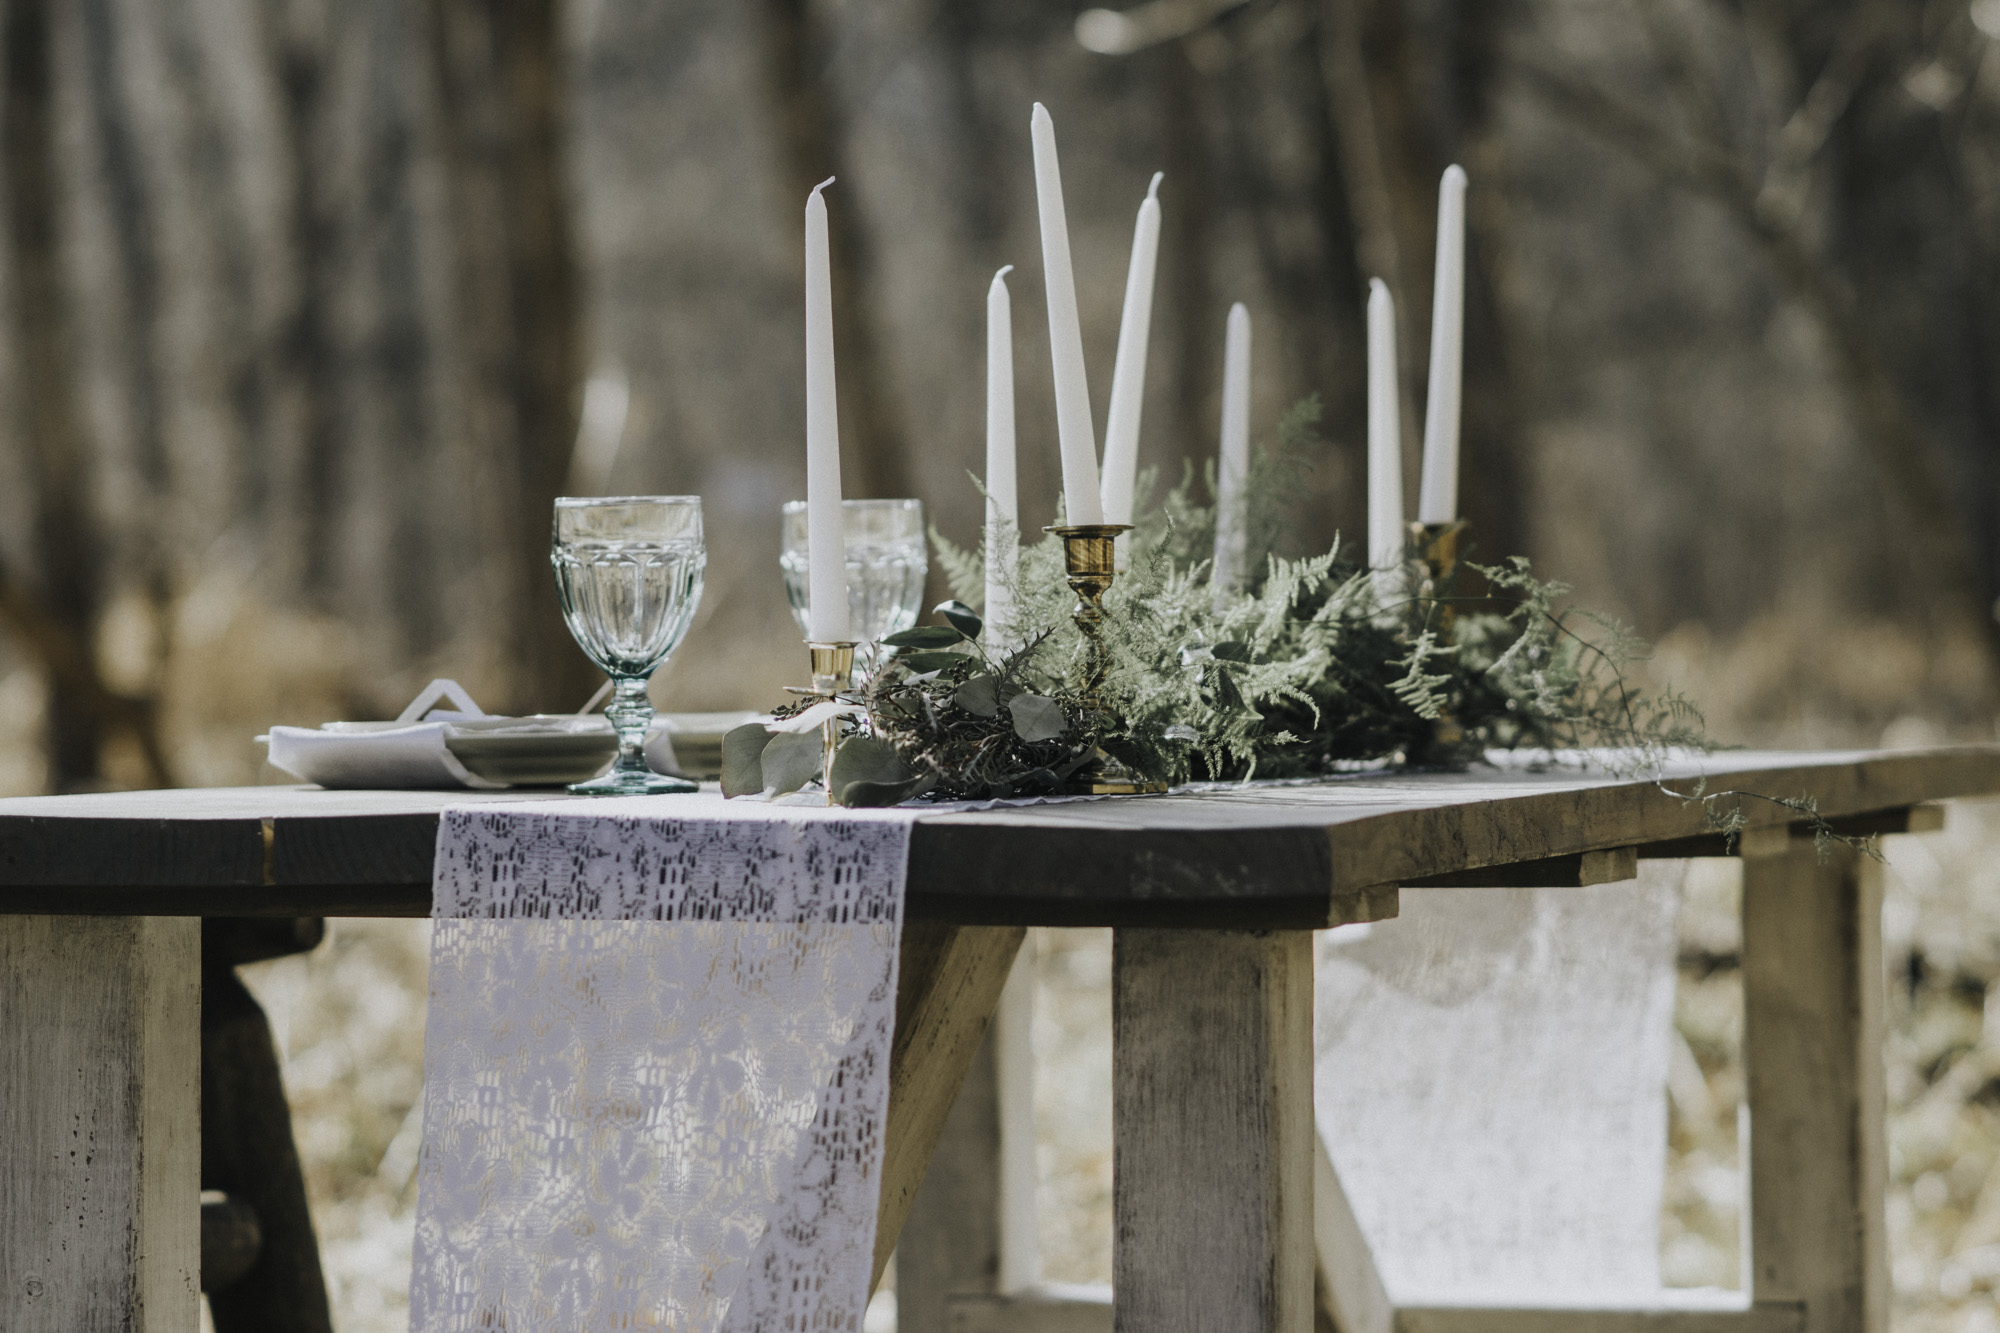 Cate_Ann_Photography_Dayton_Ohio_Wedding_Elopement_And_Engagement_PhotographerDSC_5556.jpg